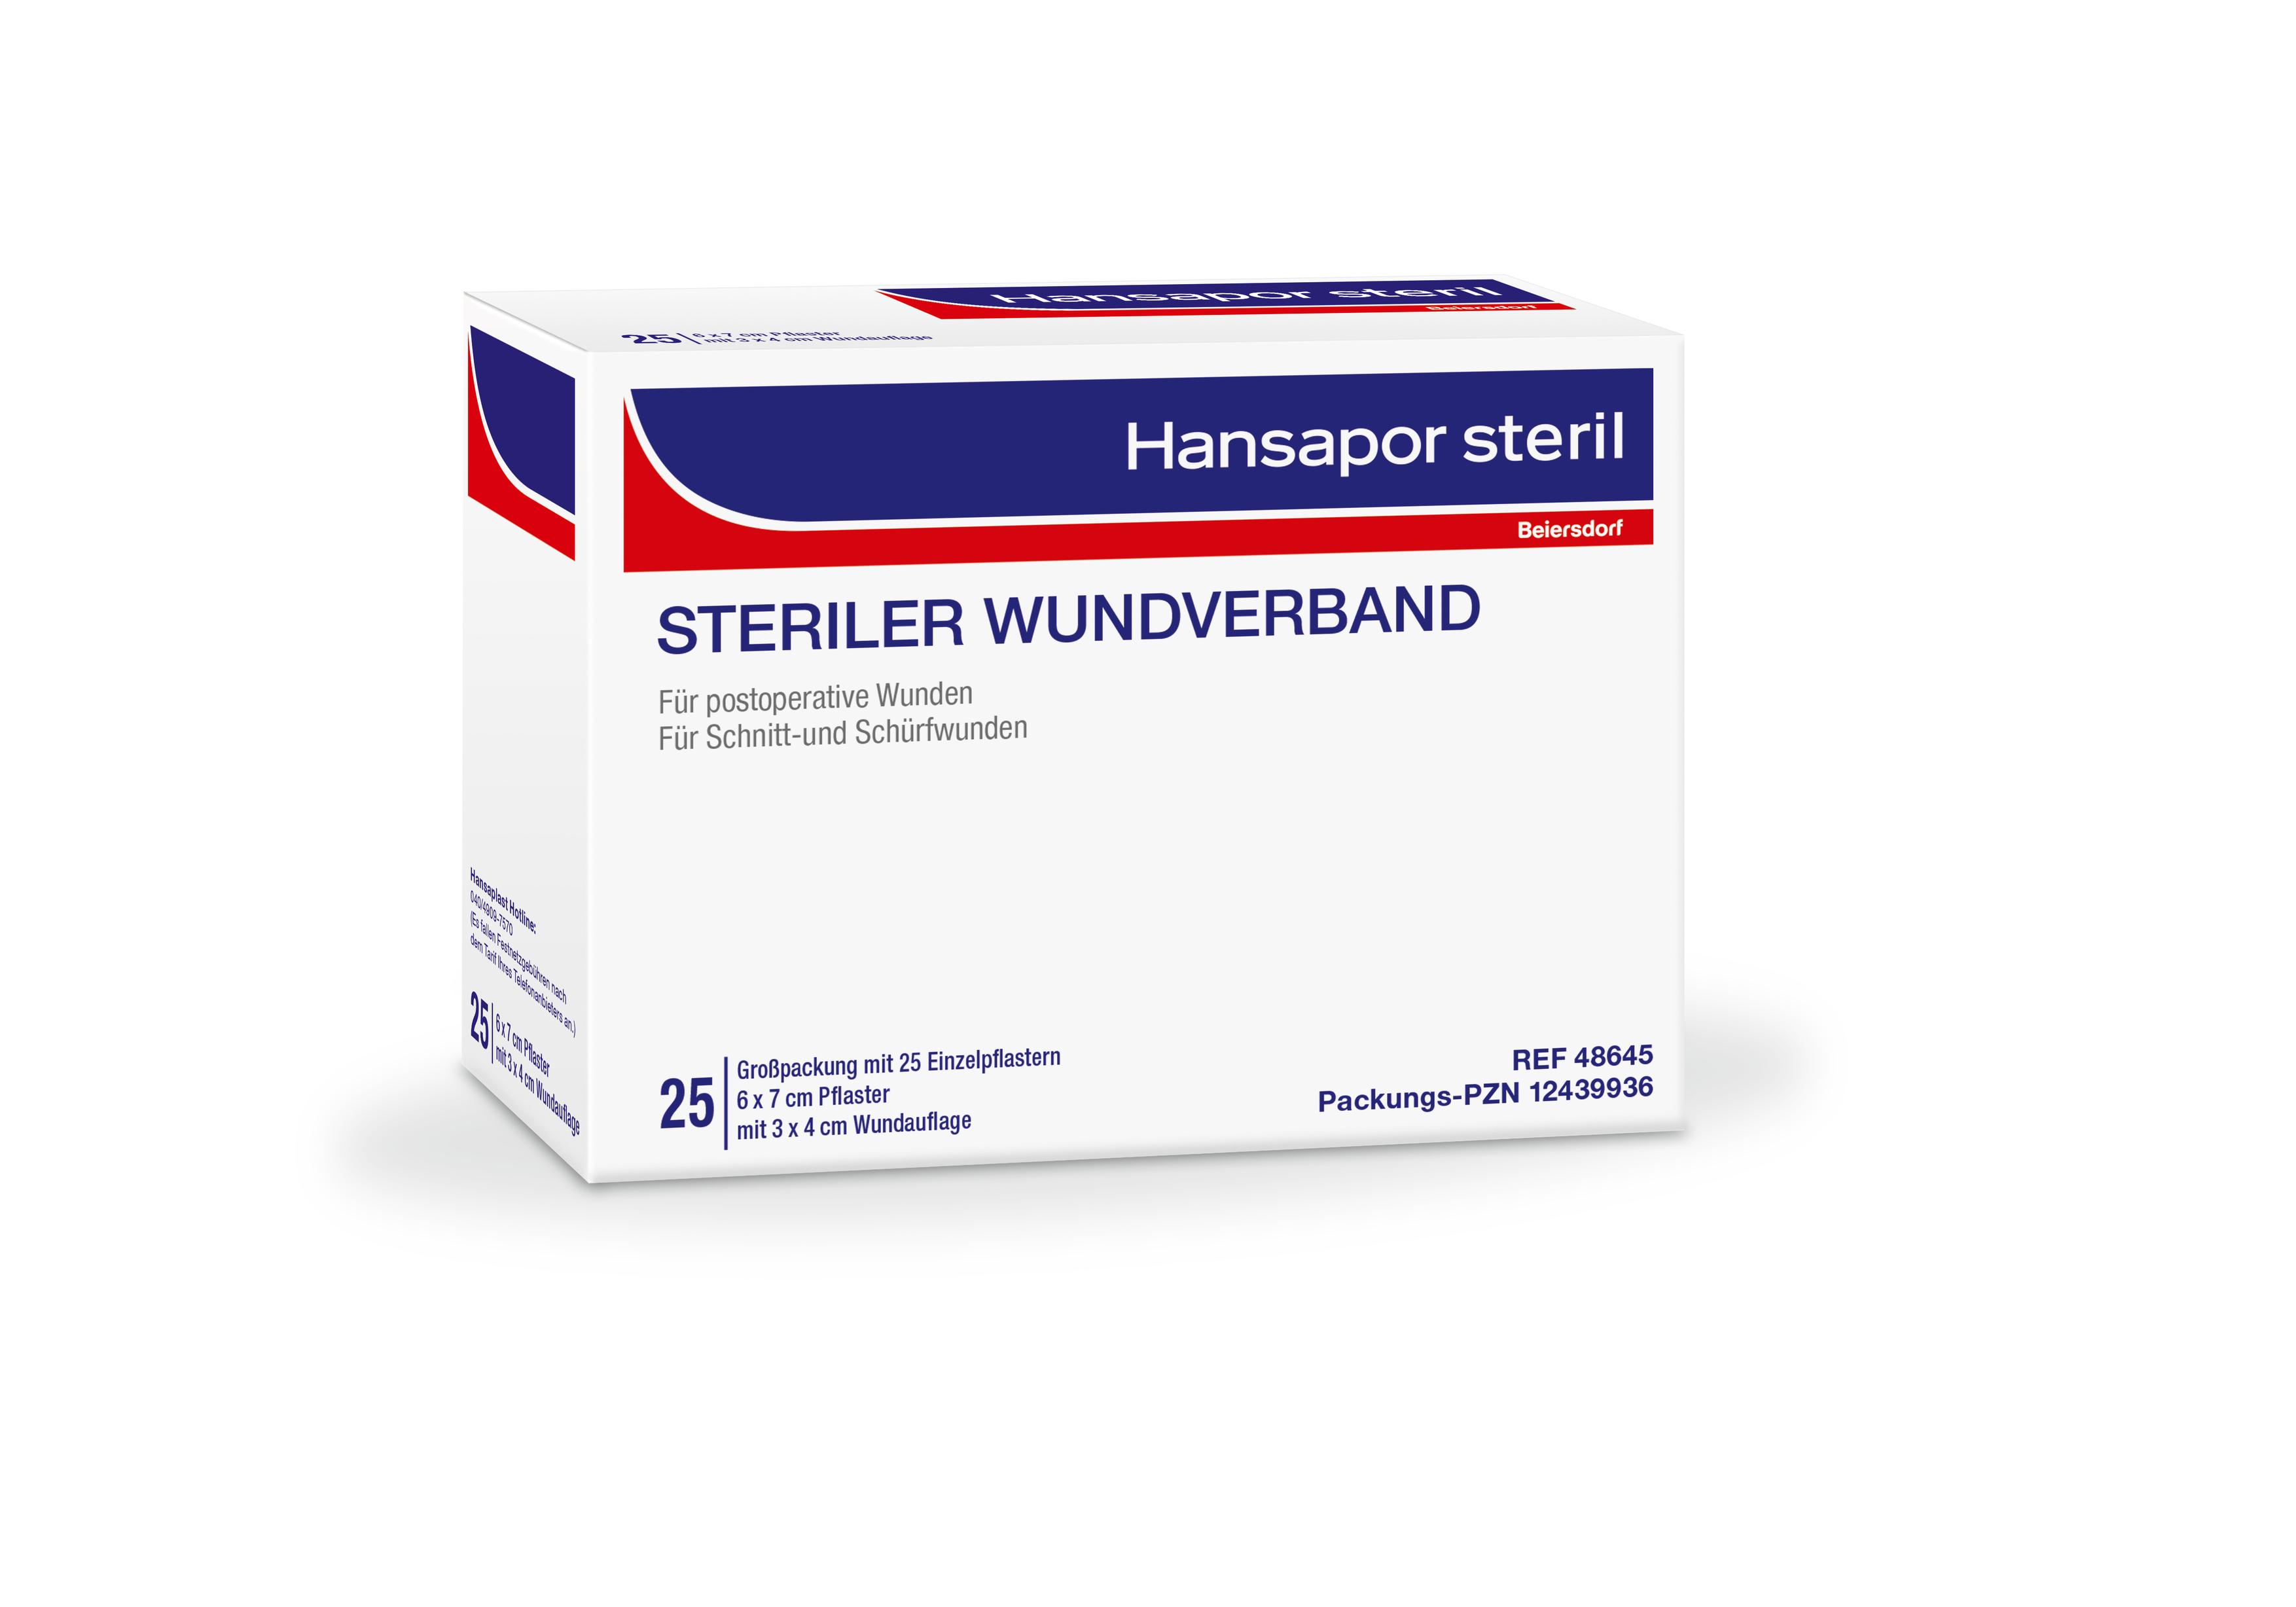 Hansapor Steril Wundverband 25er Packung, 6 x 7cm